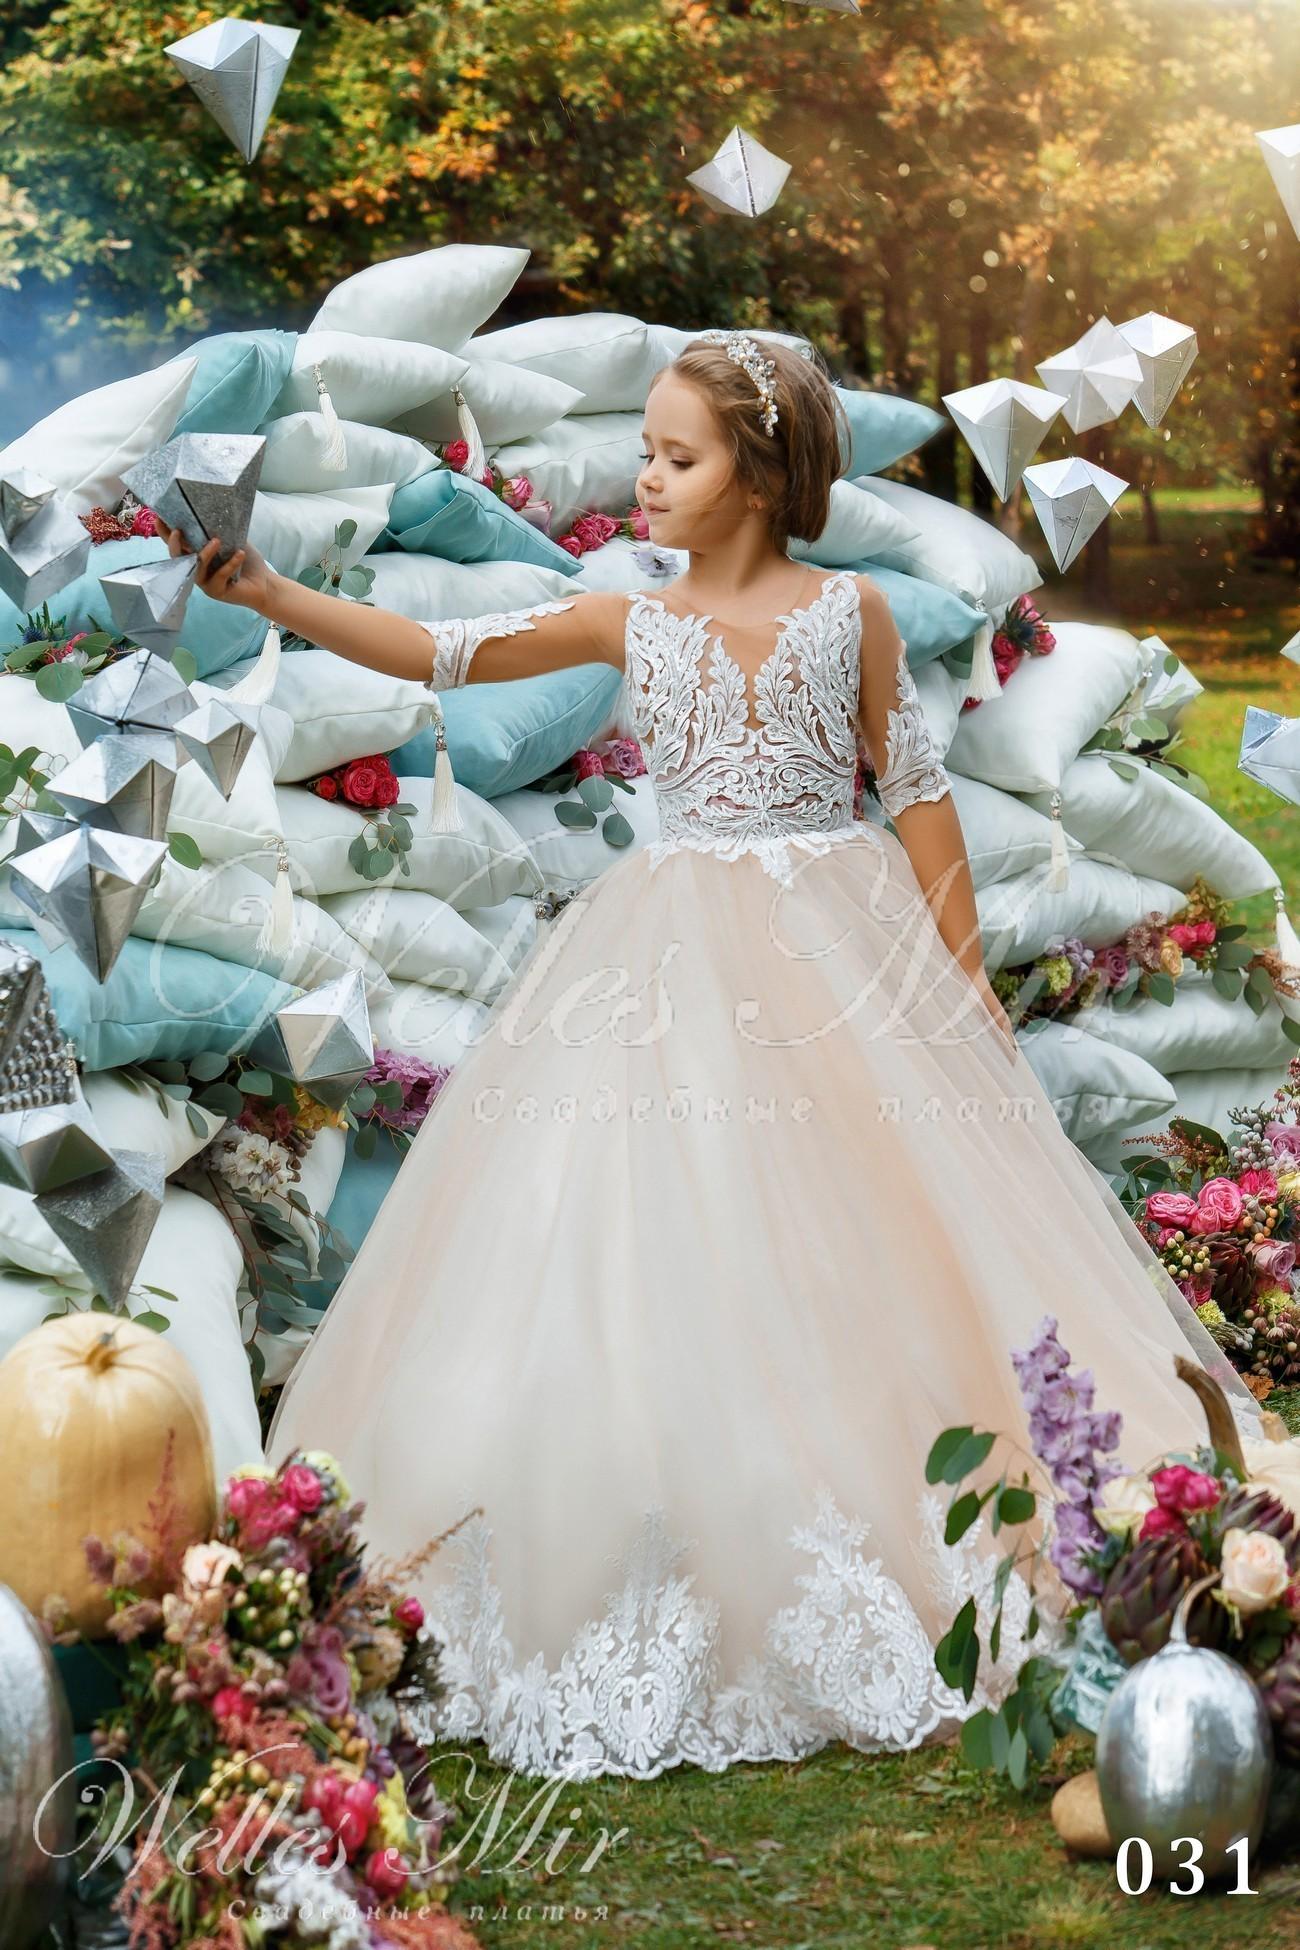 Детские платья Kids Deluxe Collection 2018 - 031